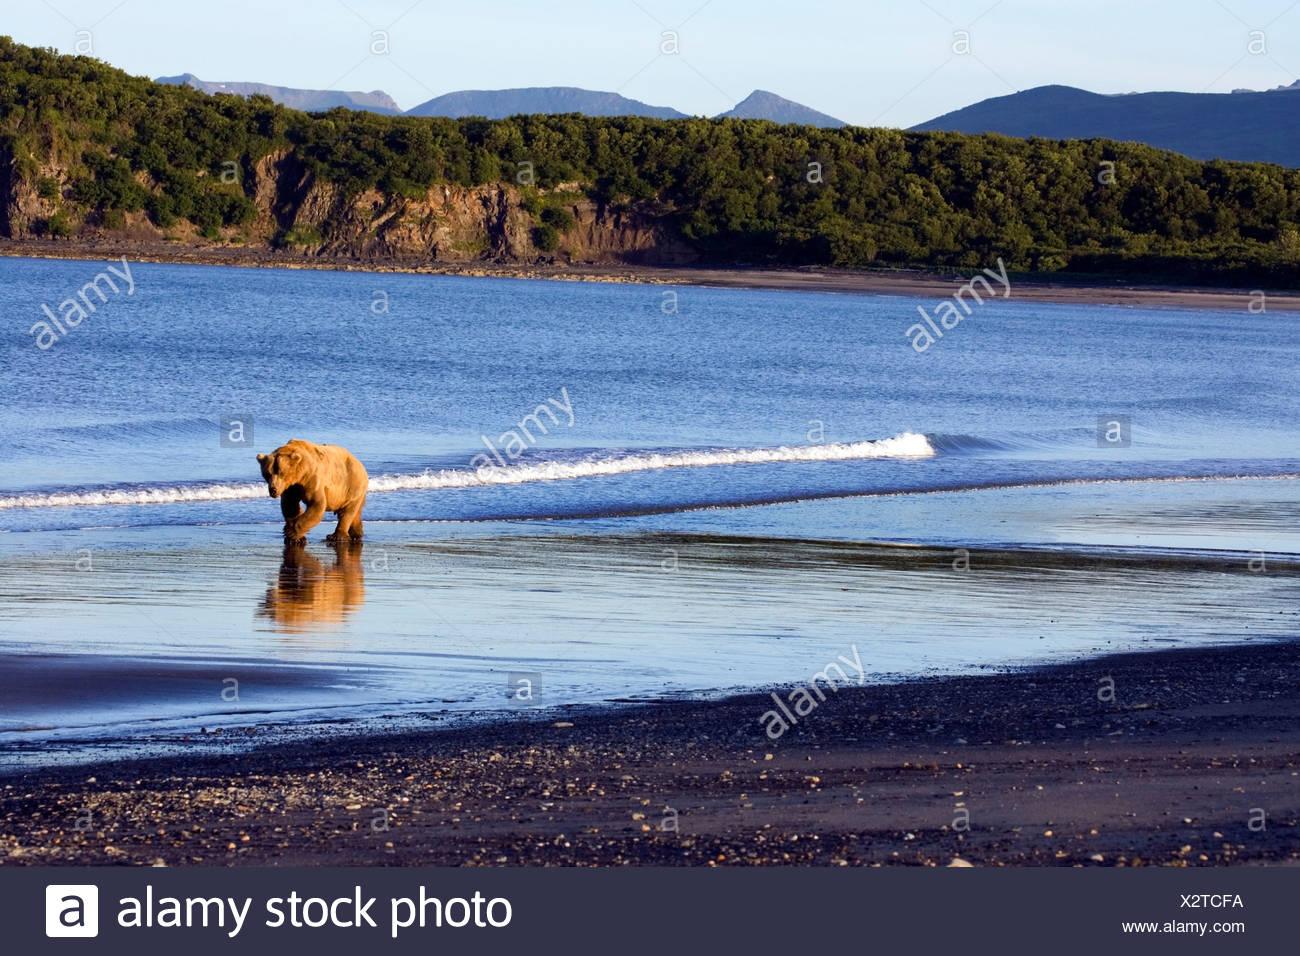 Brown bear walks along the shoreline in the Kaguyak area of Katmai National Park, Alaska - Stock Image